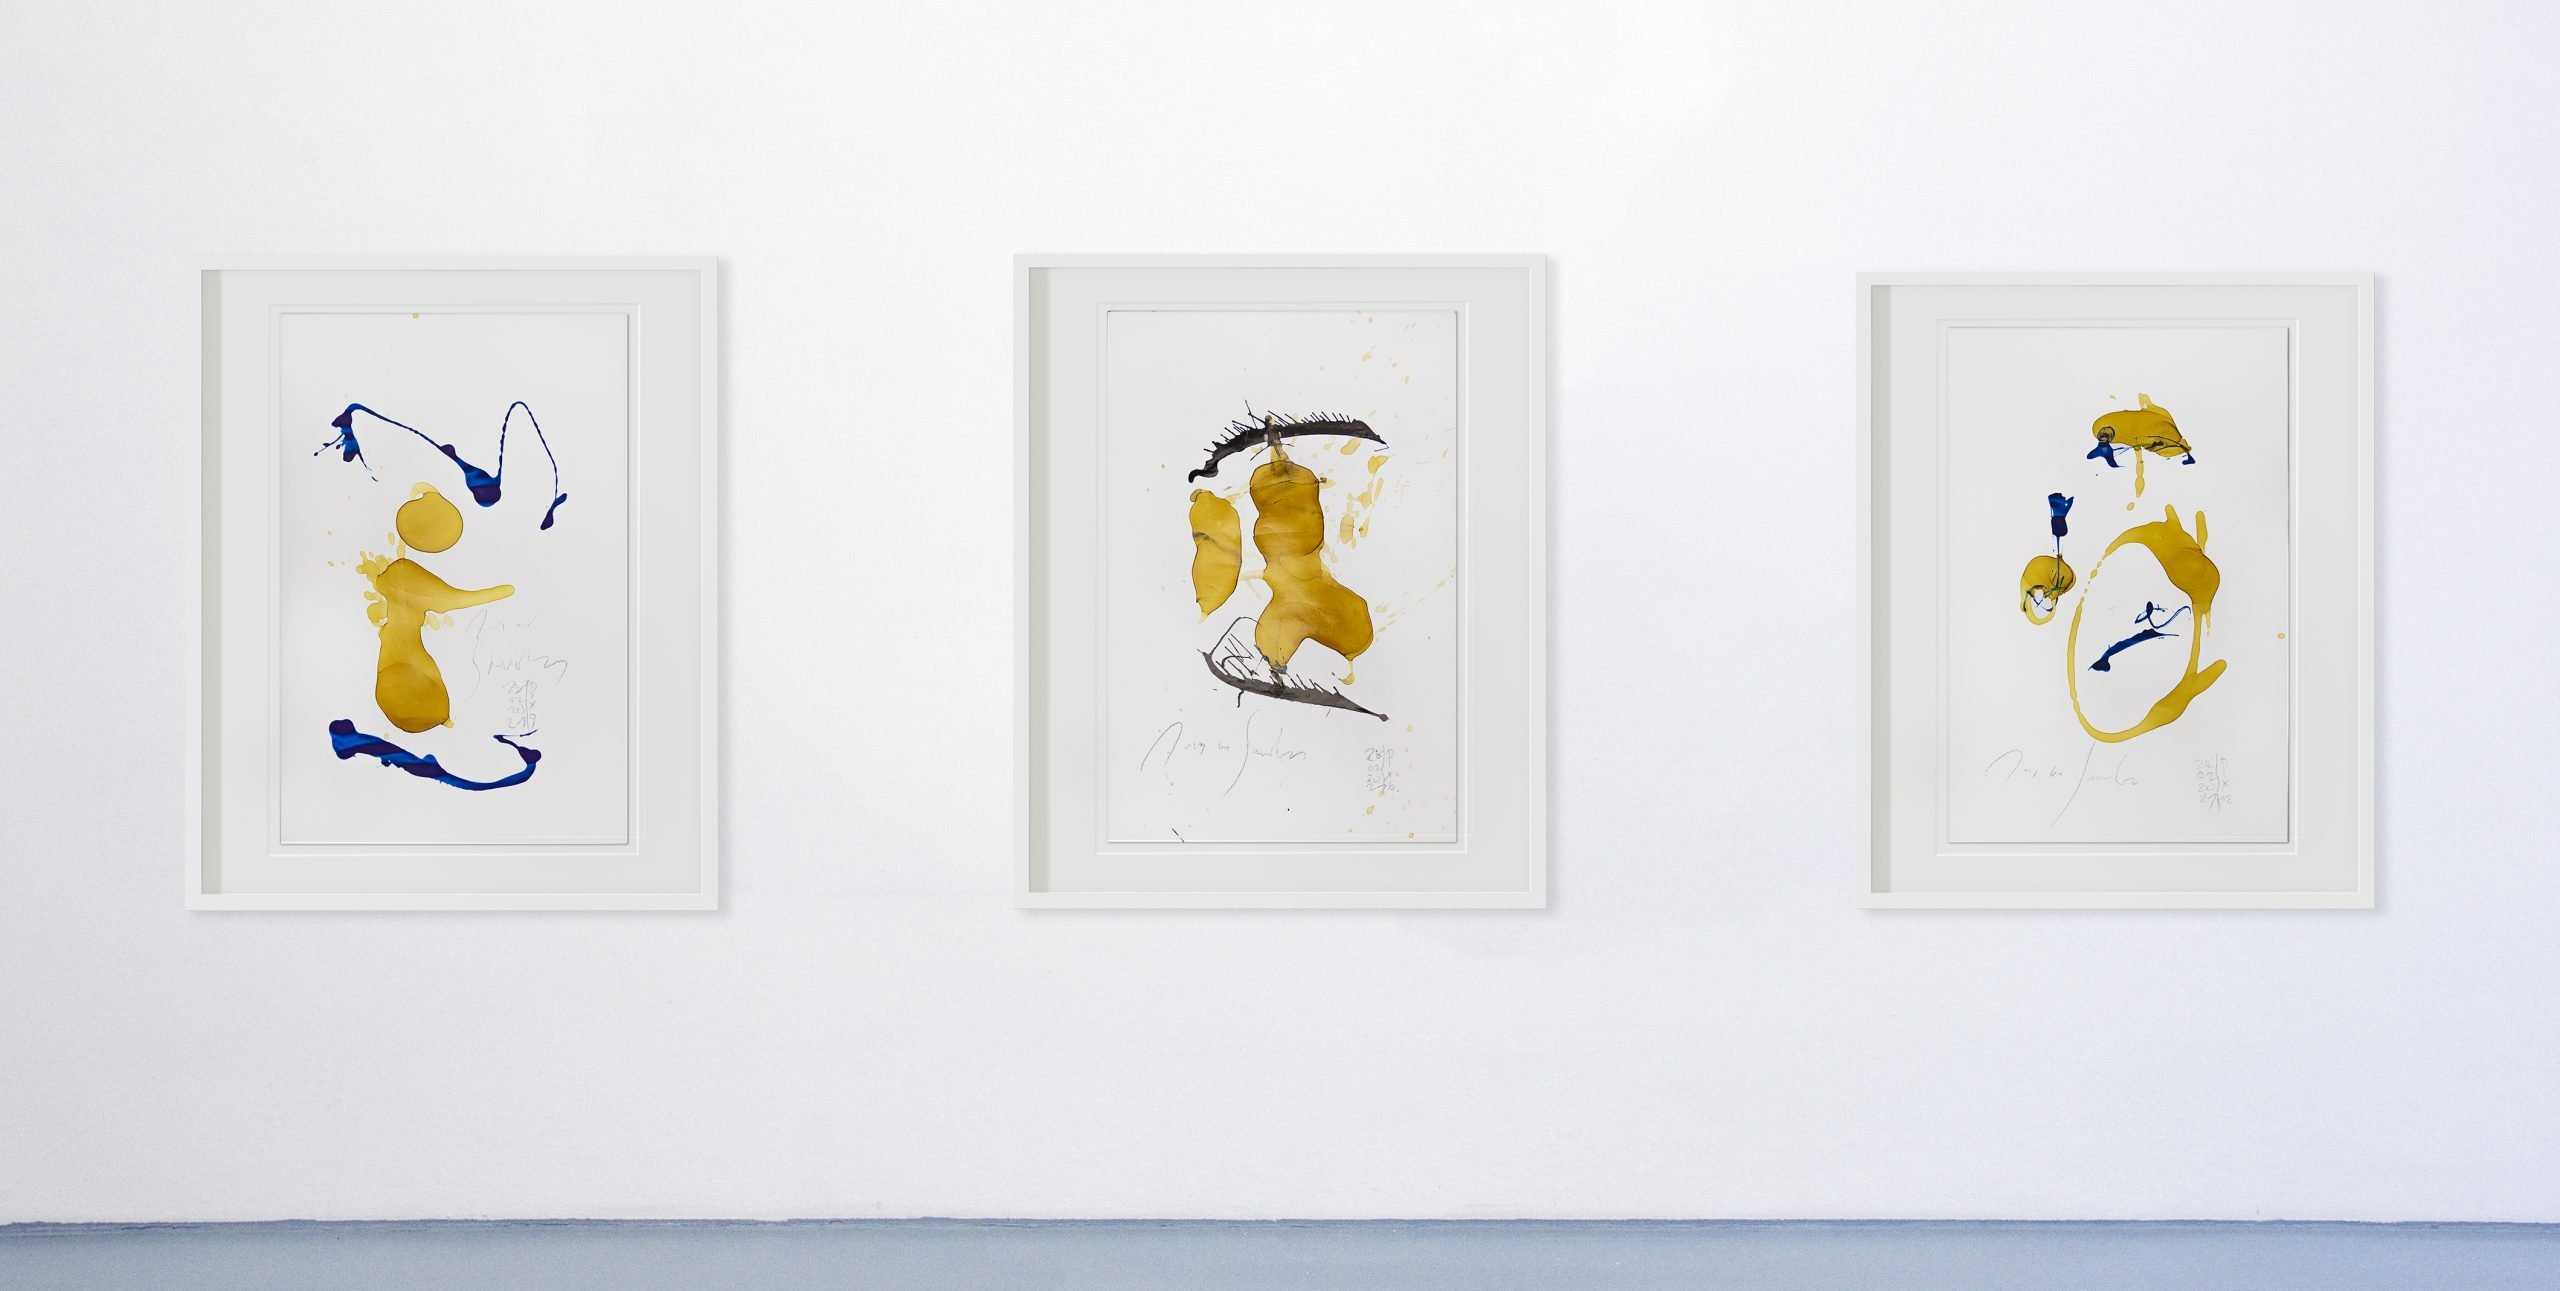 Galerie_Wand_schmal_DIX